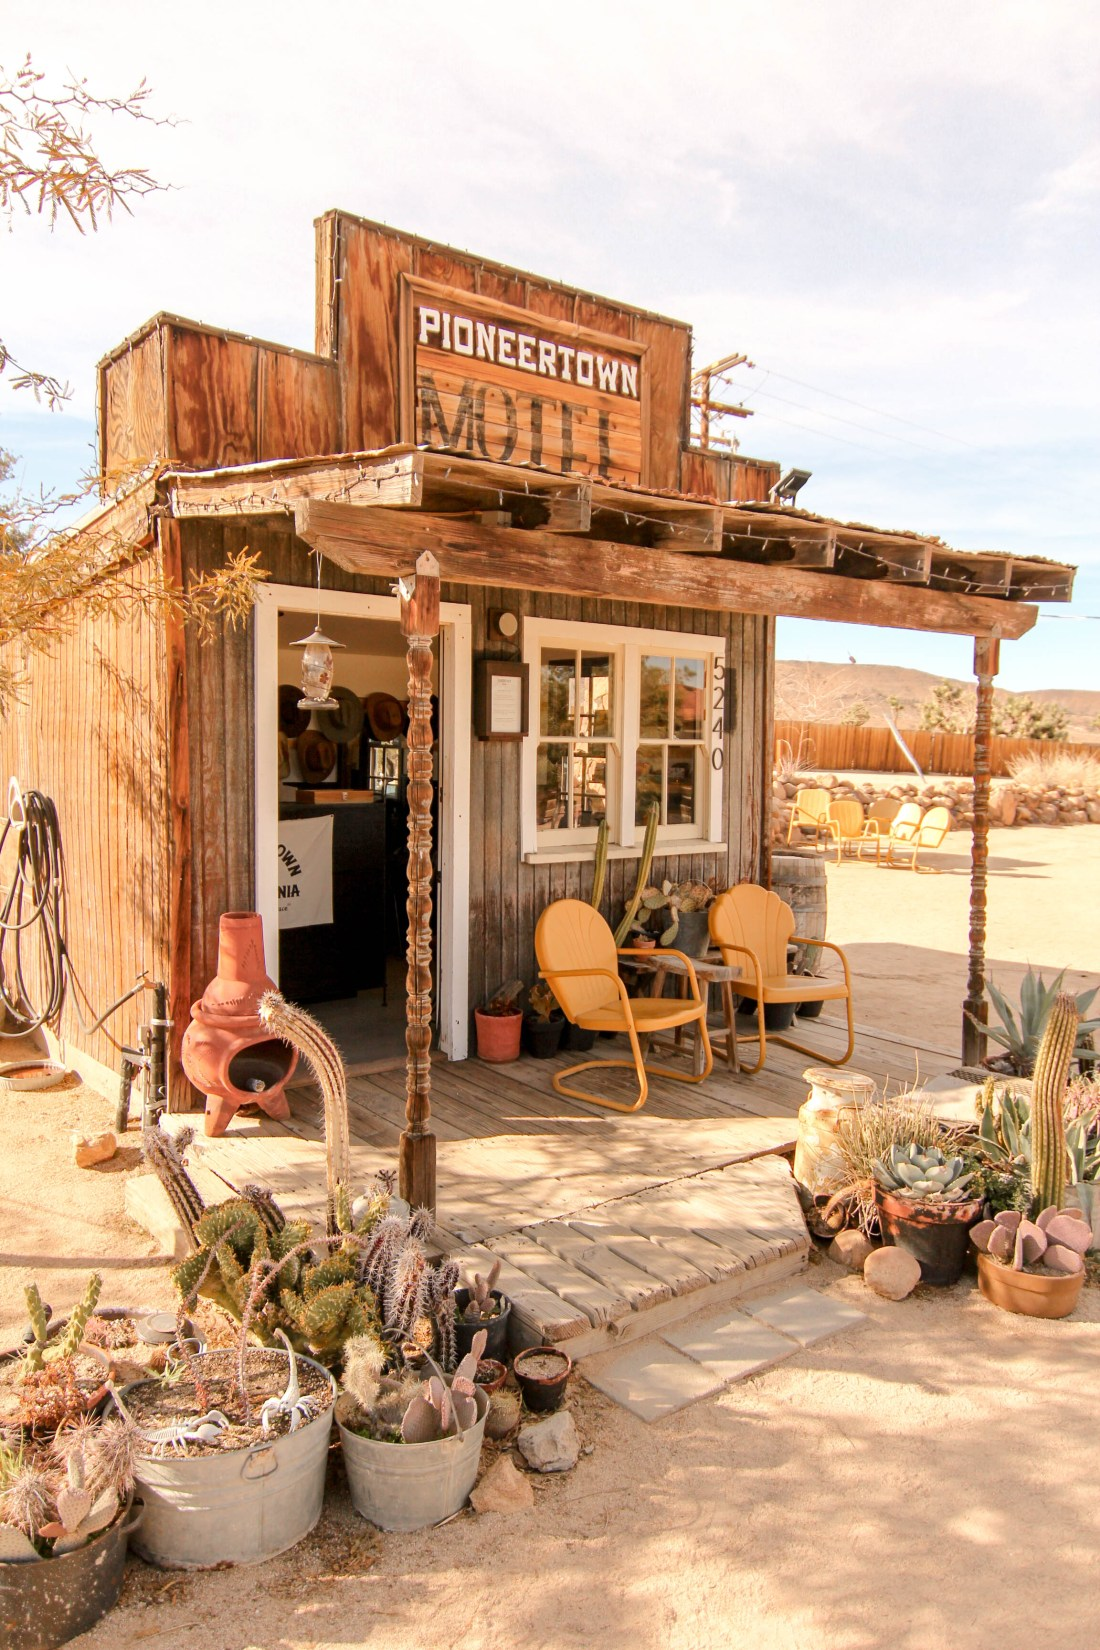 pioneertown motel office